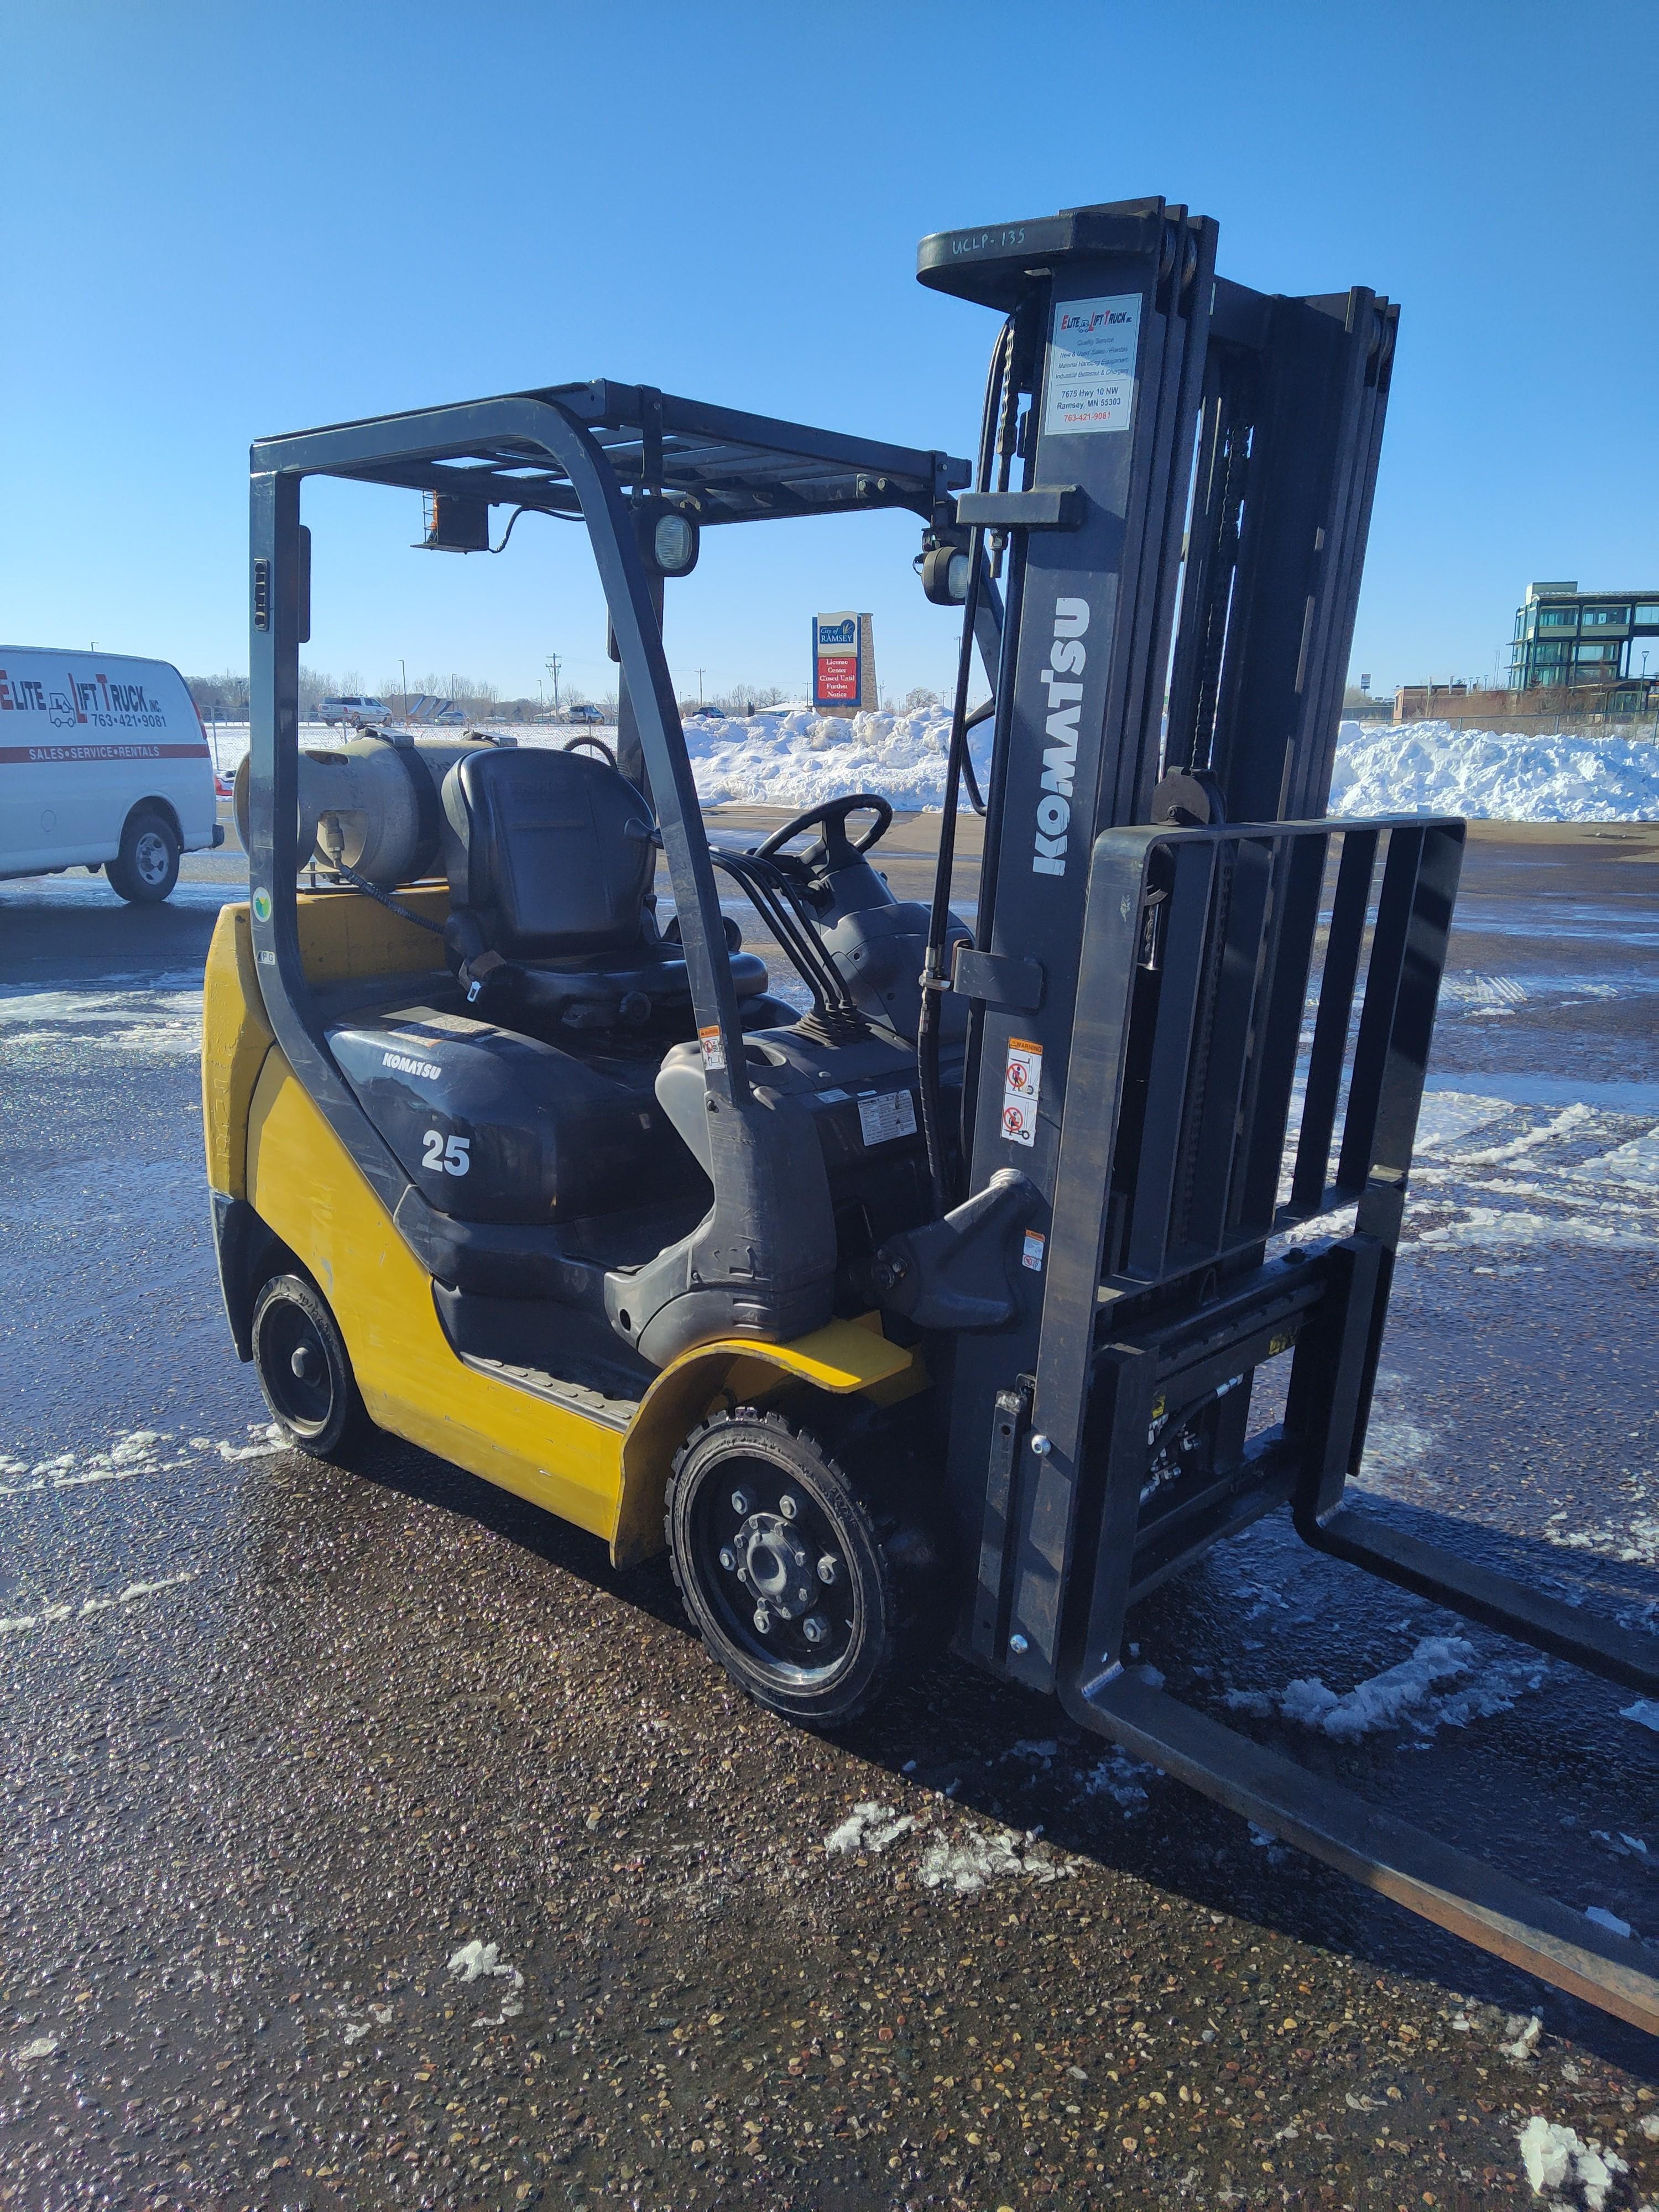 Used, 2017, Komatsu, FG25ST-16, Forklifts / Lift Trucks